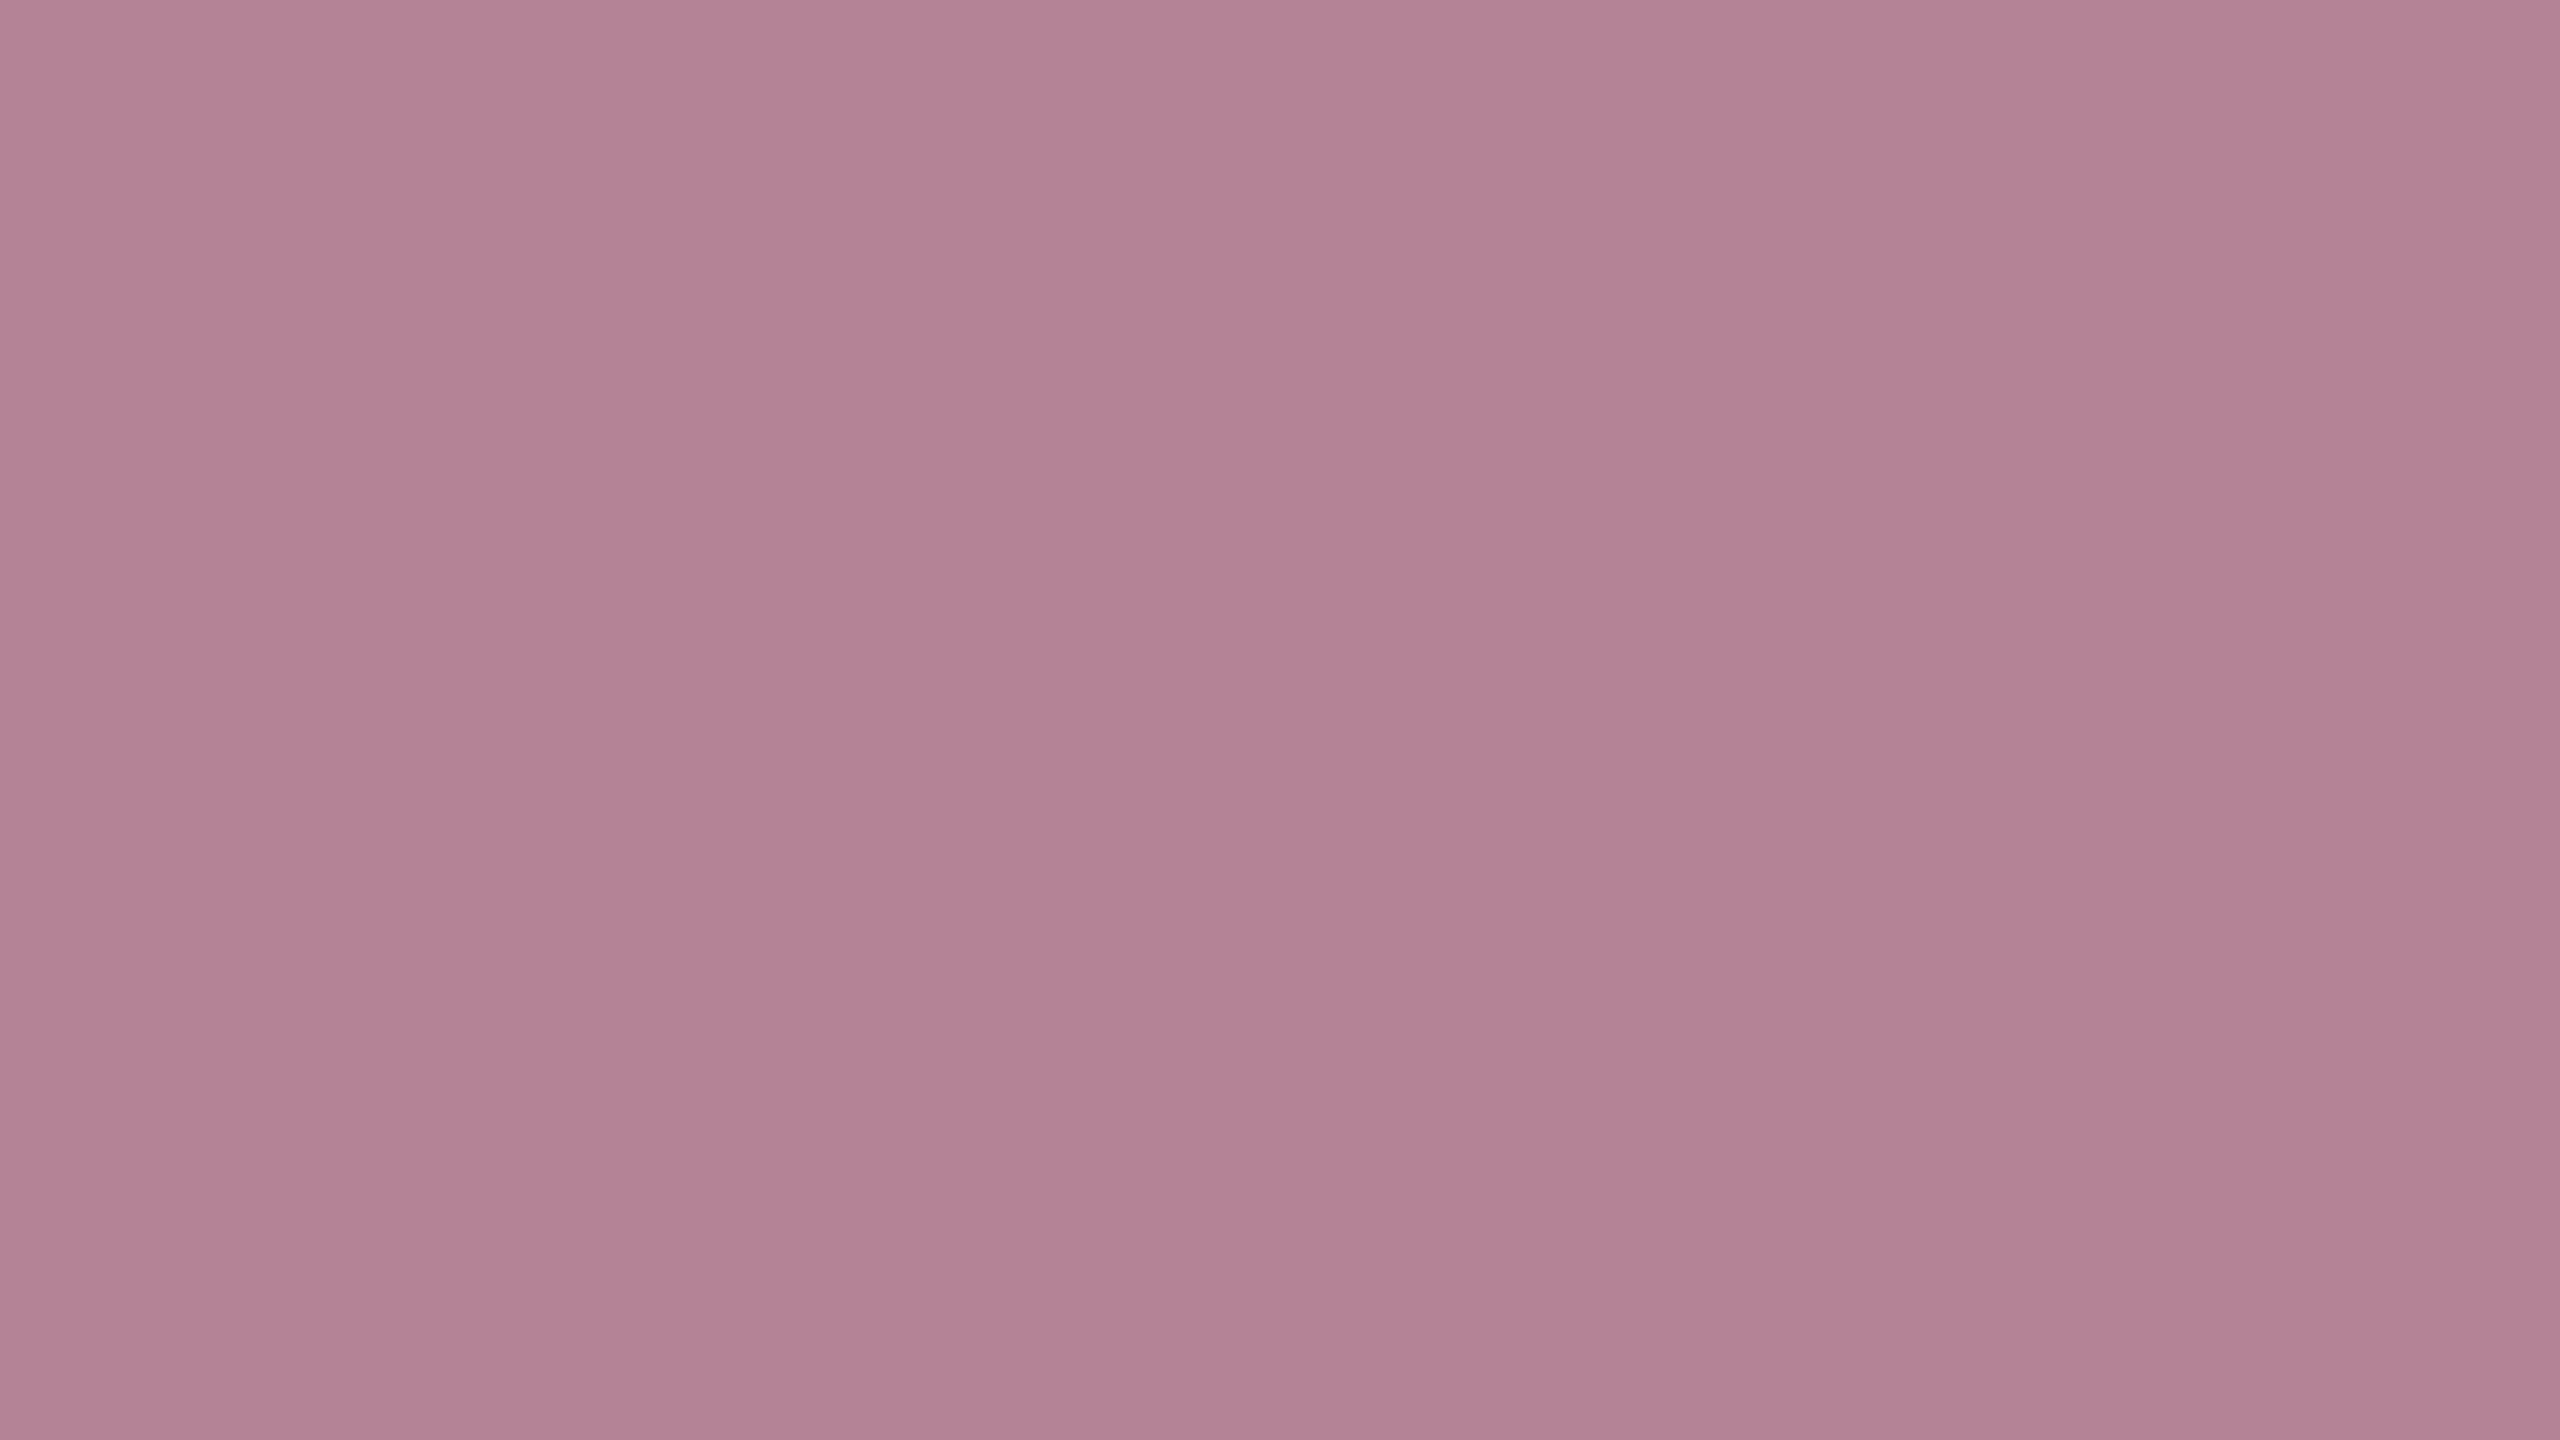 English Lavender Solid Color Background